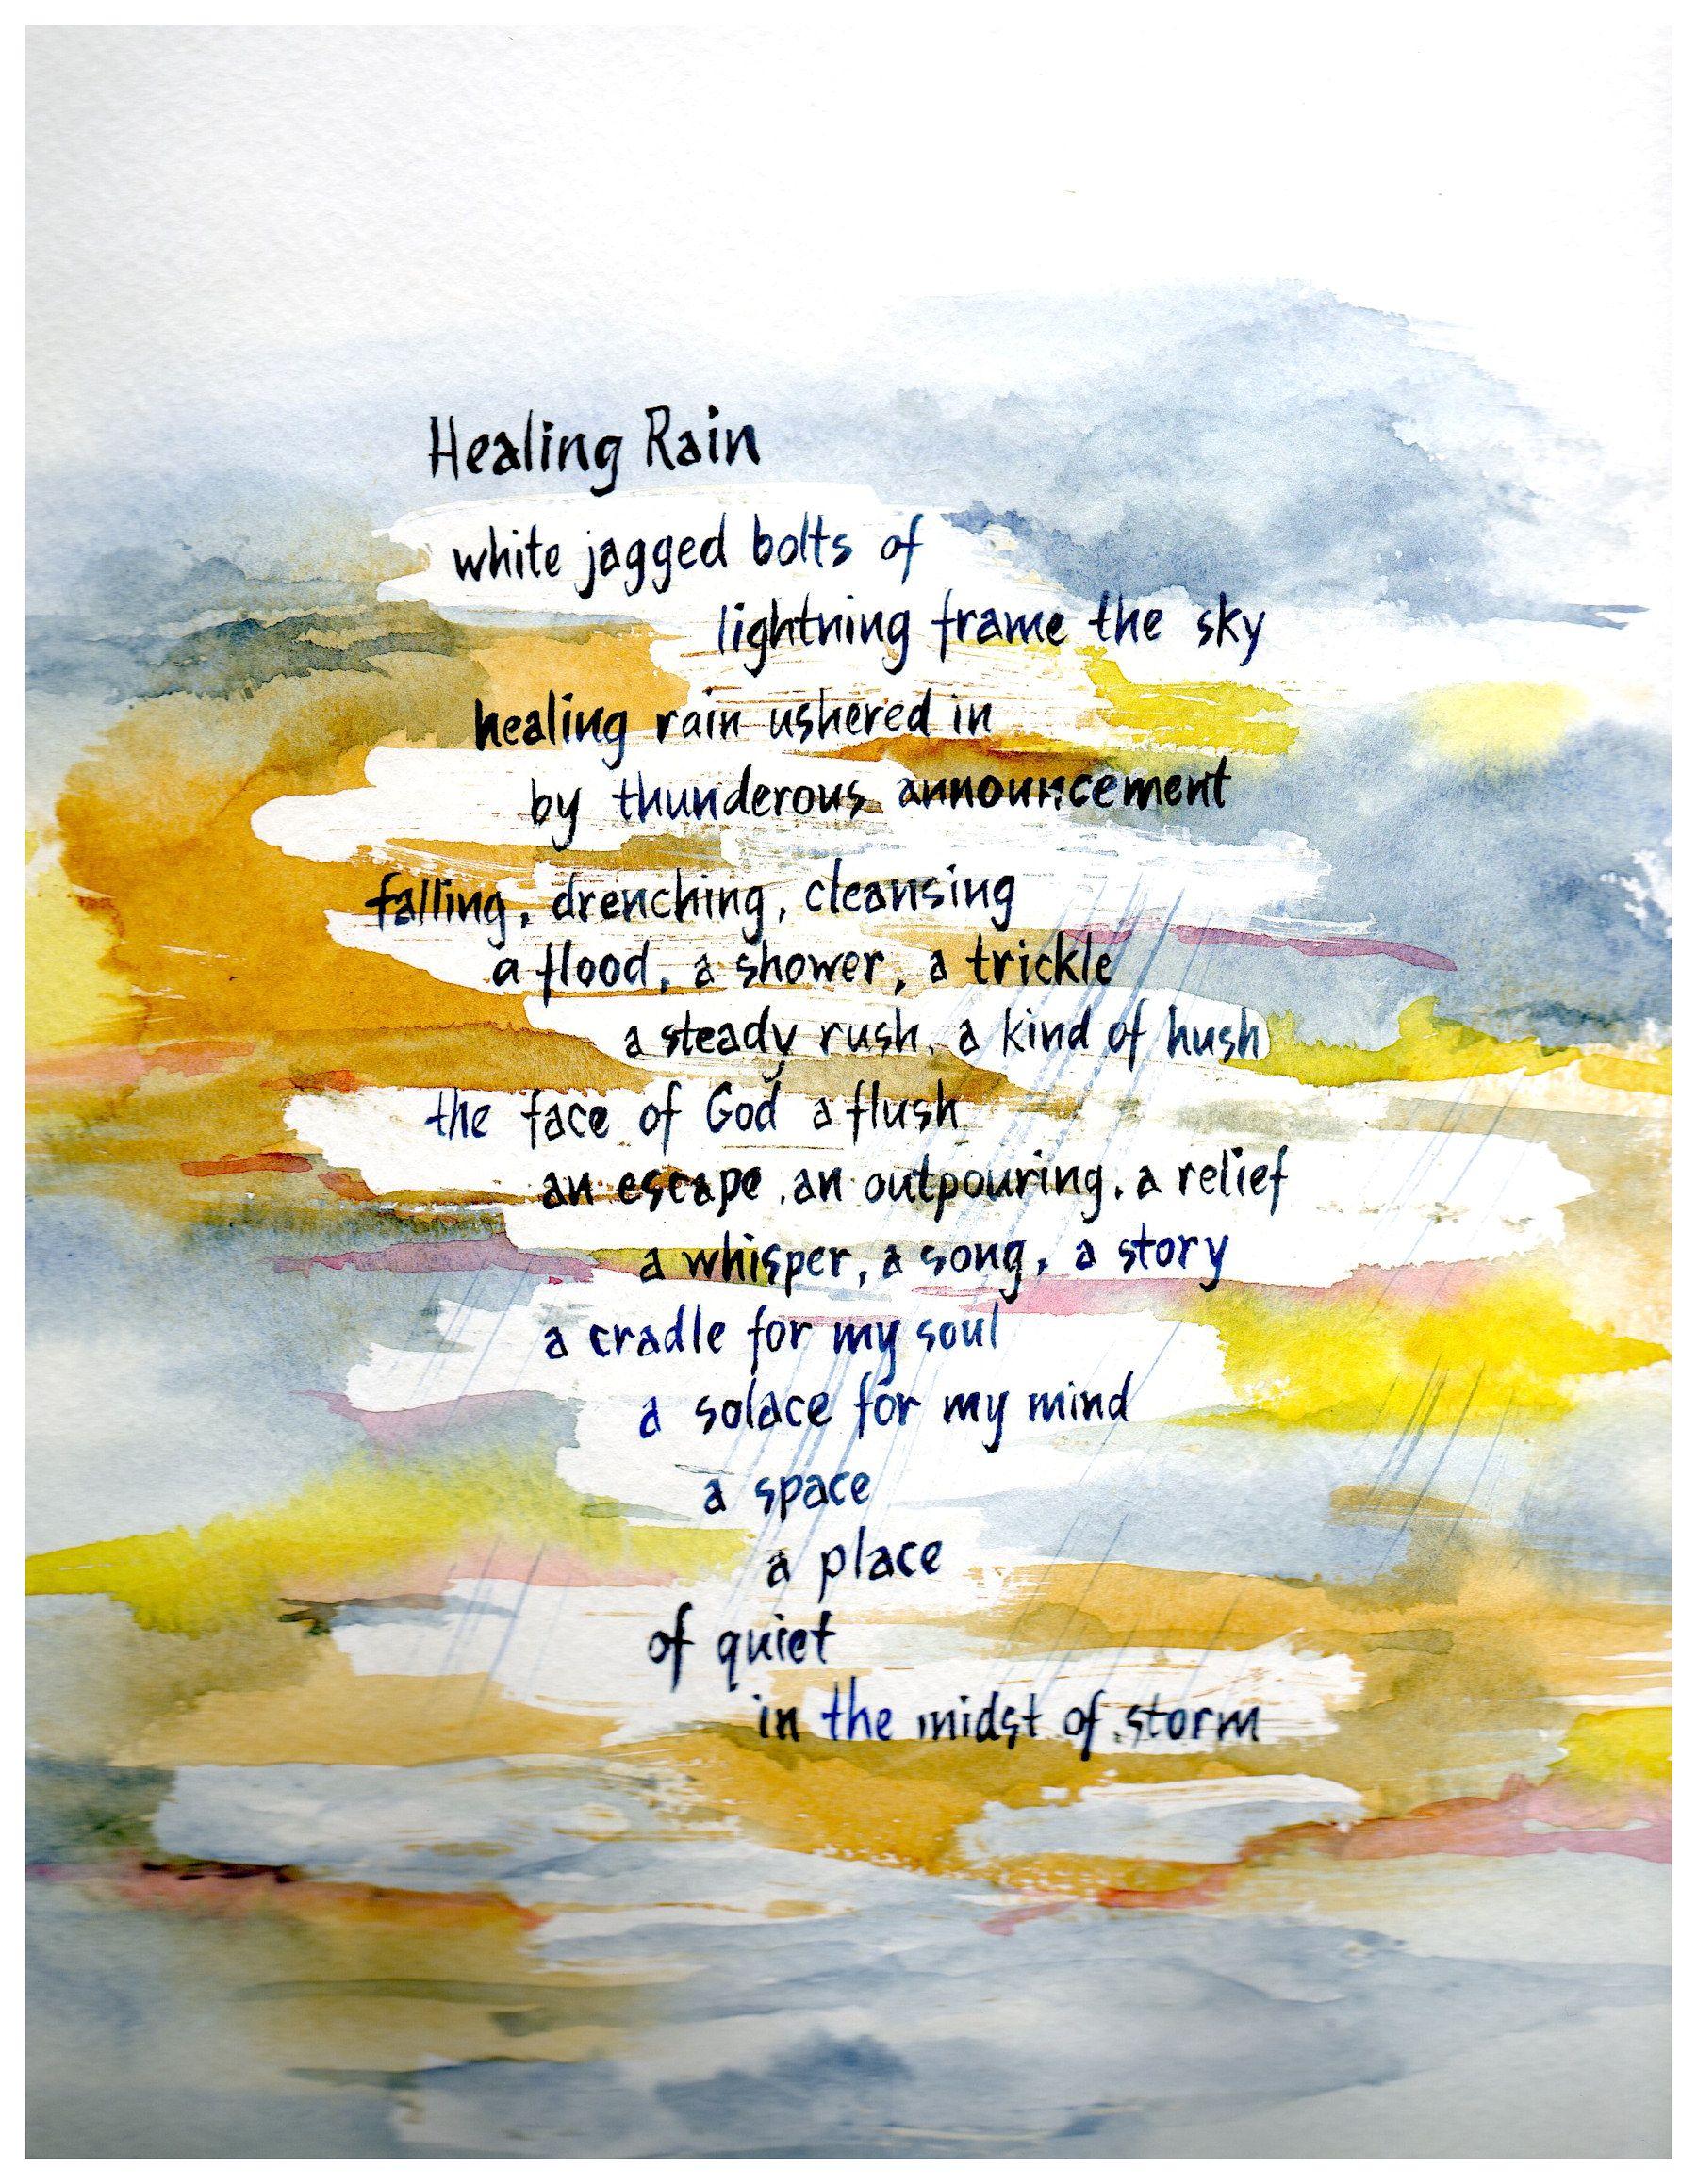 """Healing Rain"" by Dianne Polome"